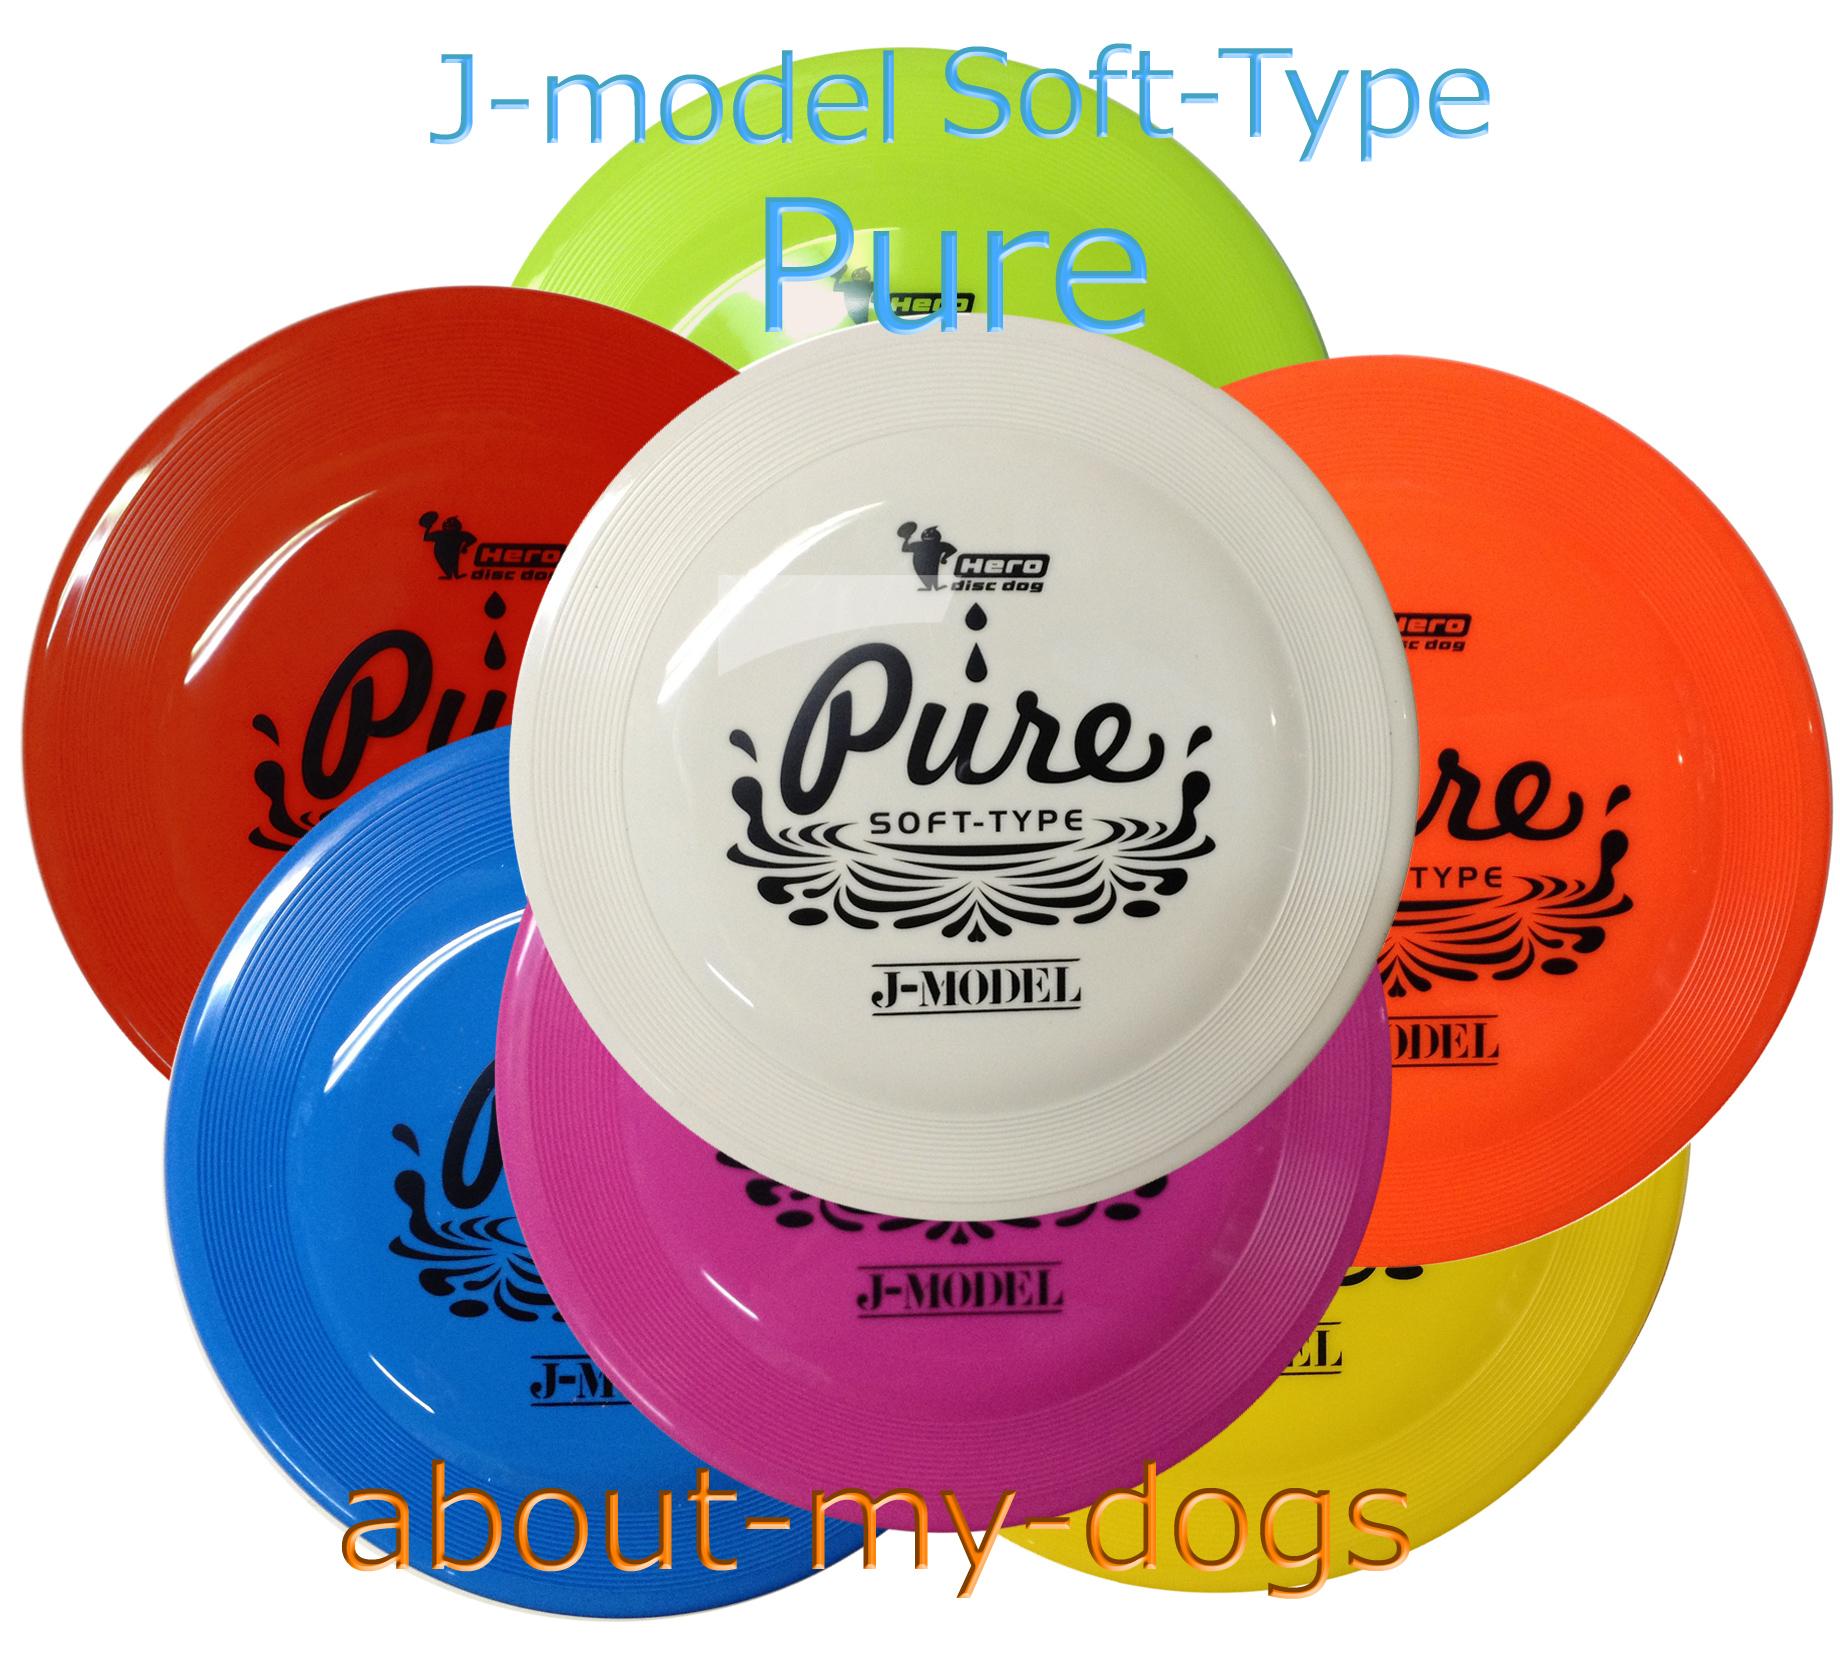 Hero J-model soft-type Pure 純国産ソフトタイプディスク